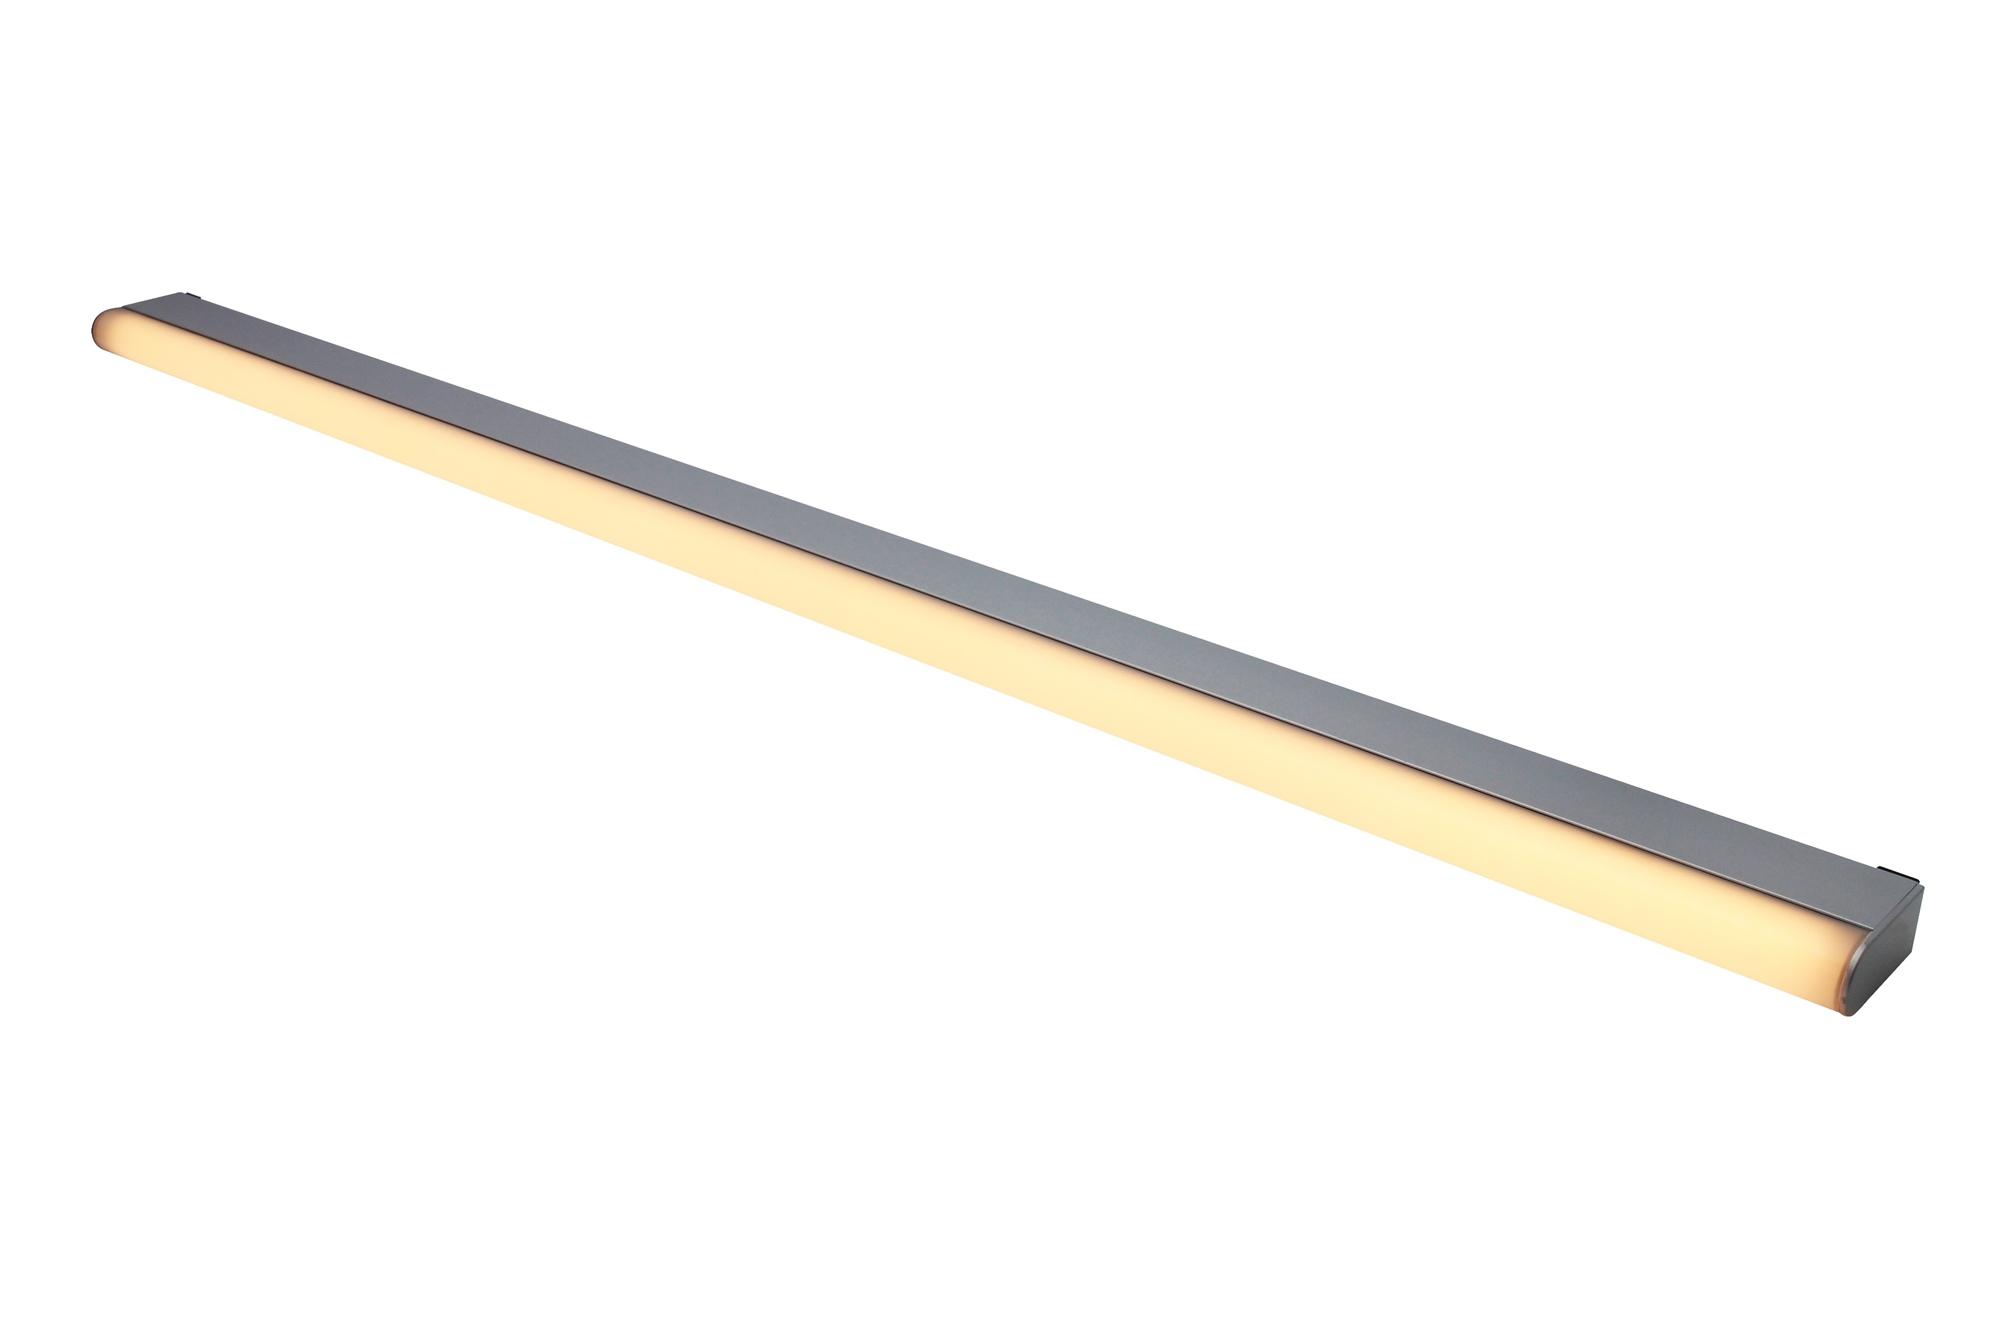 Lampenlux LED Wandlampe Wandleuchte Aras Badlicht grau 10/14/18W 60/90/120cm inkl. Trafo